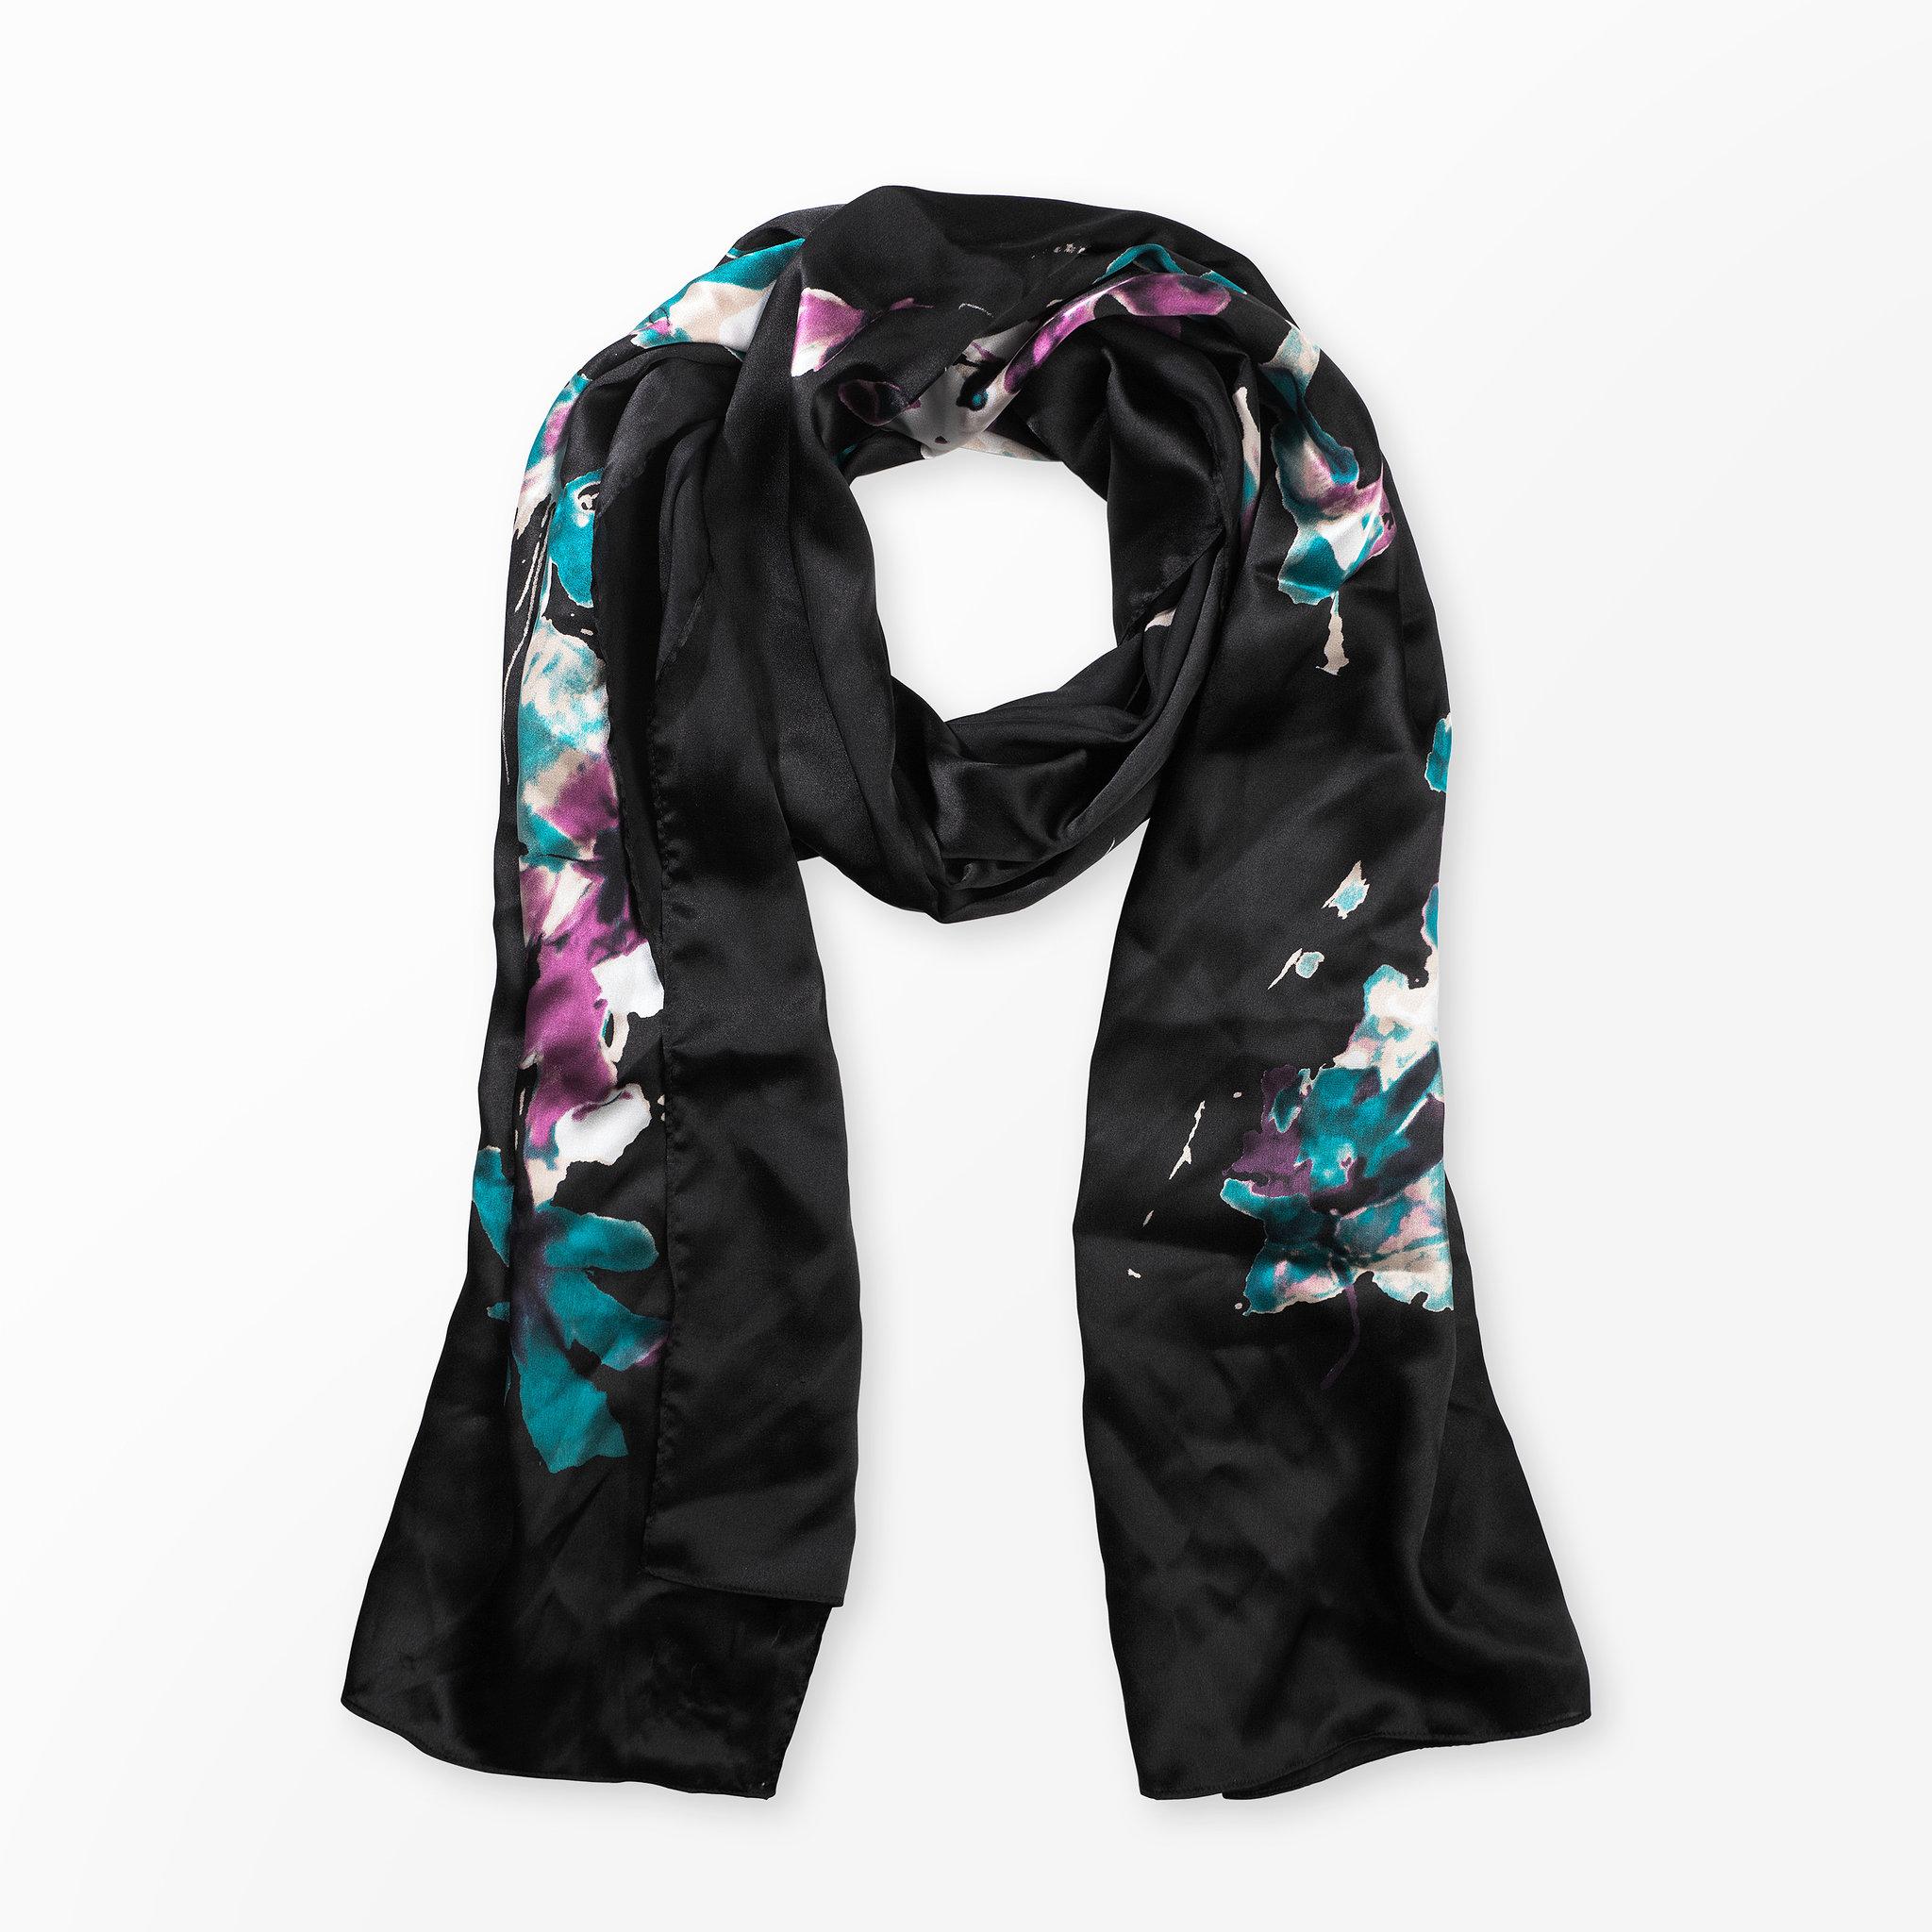 Scarf i silke - Halsdukar   scarves - Köp online på åhlens.se! 0907c00d0d471